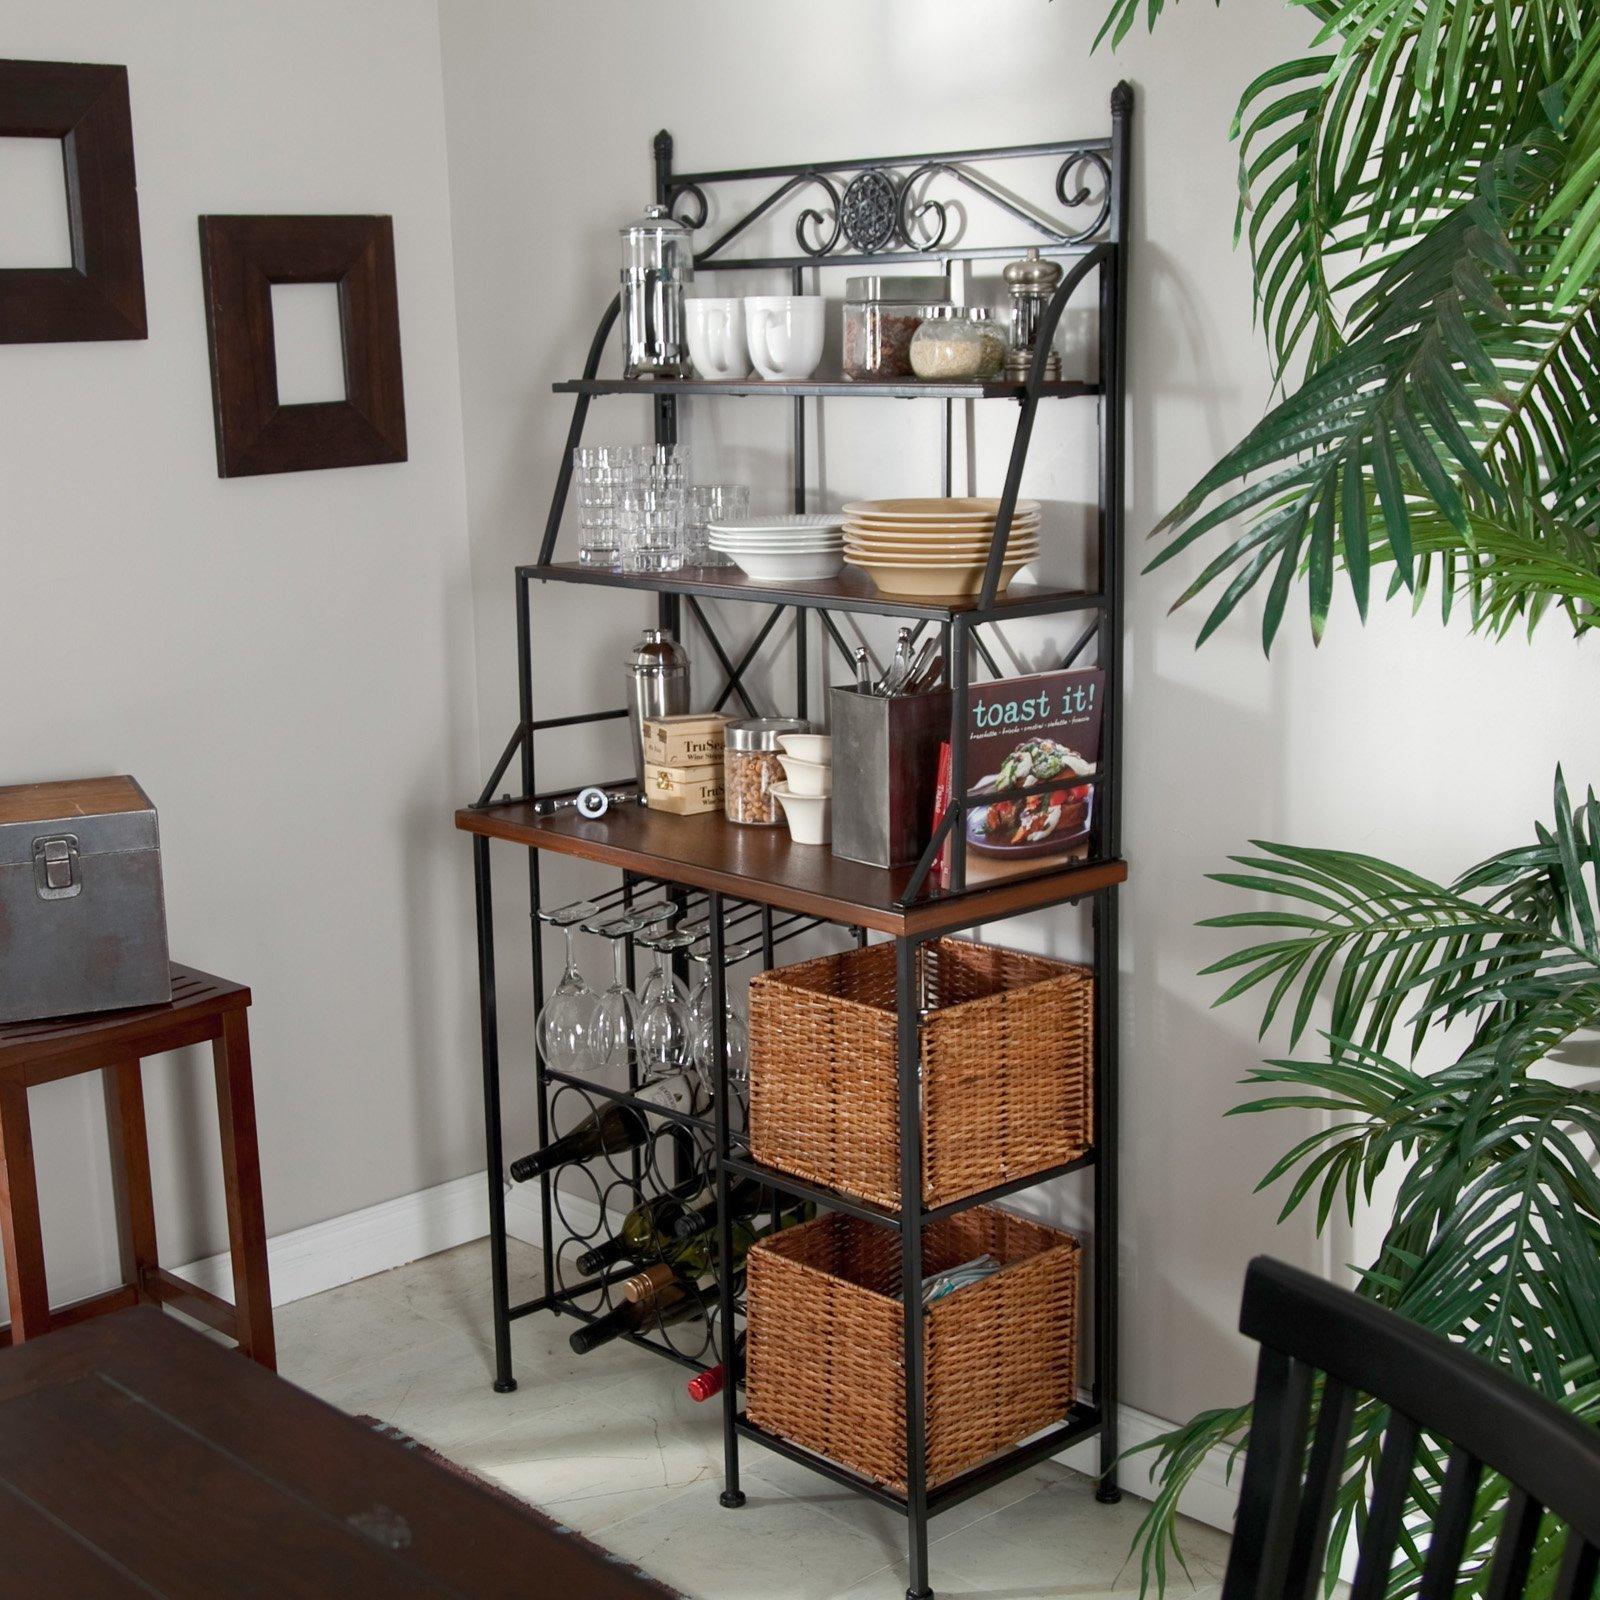 Belham Living Solano Bakers Rack with Baskets by Belham Living (Image #8)